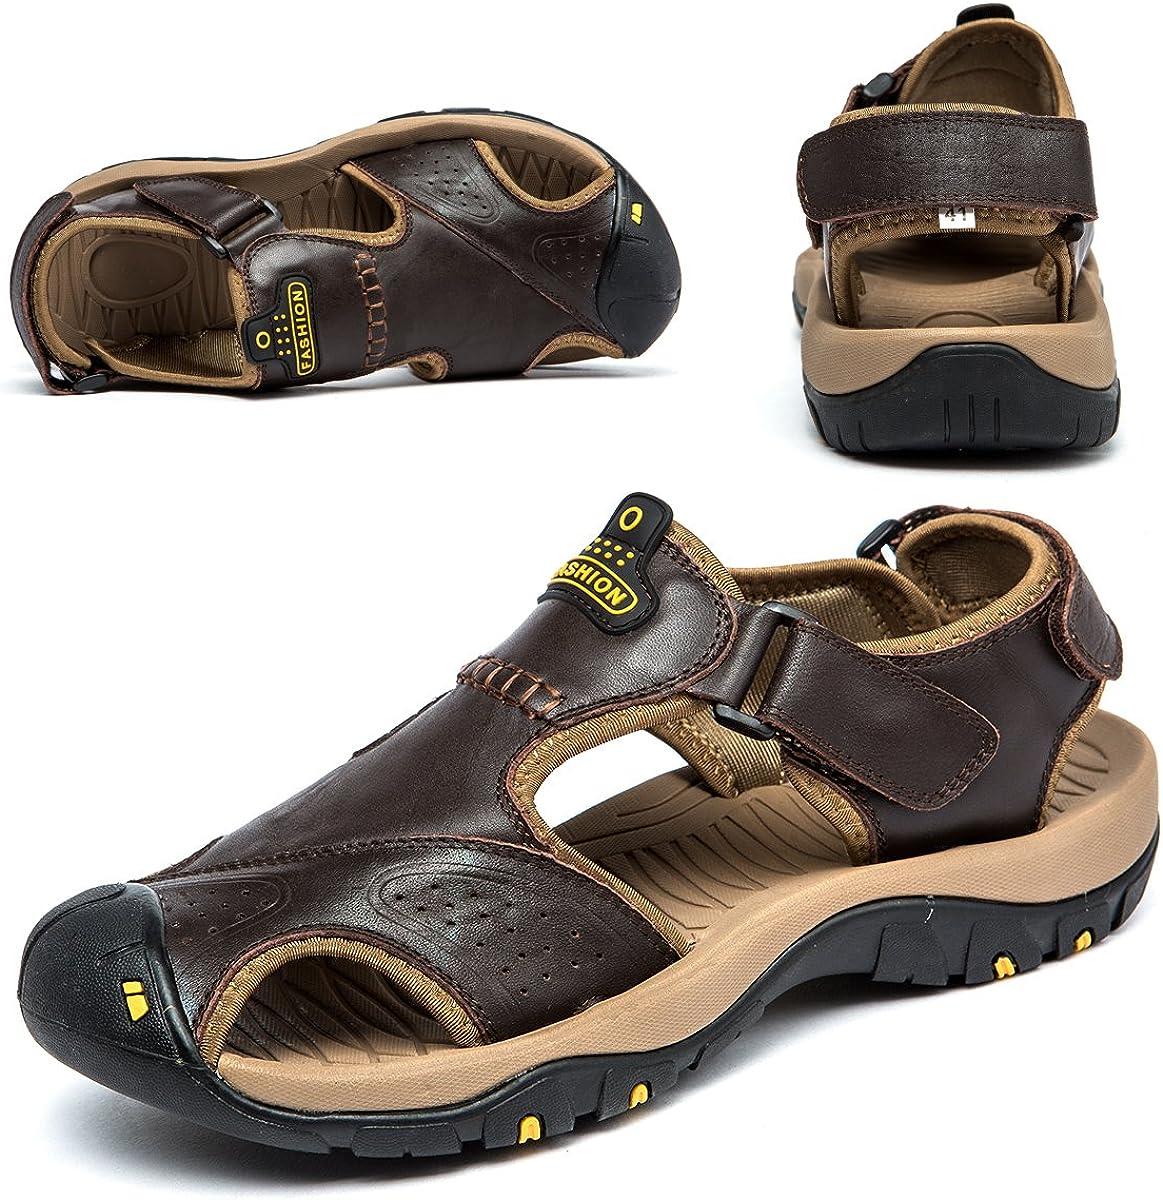 BINSHUN Sandals for Men Sports Hiking